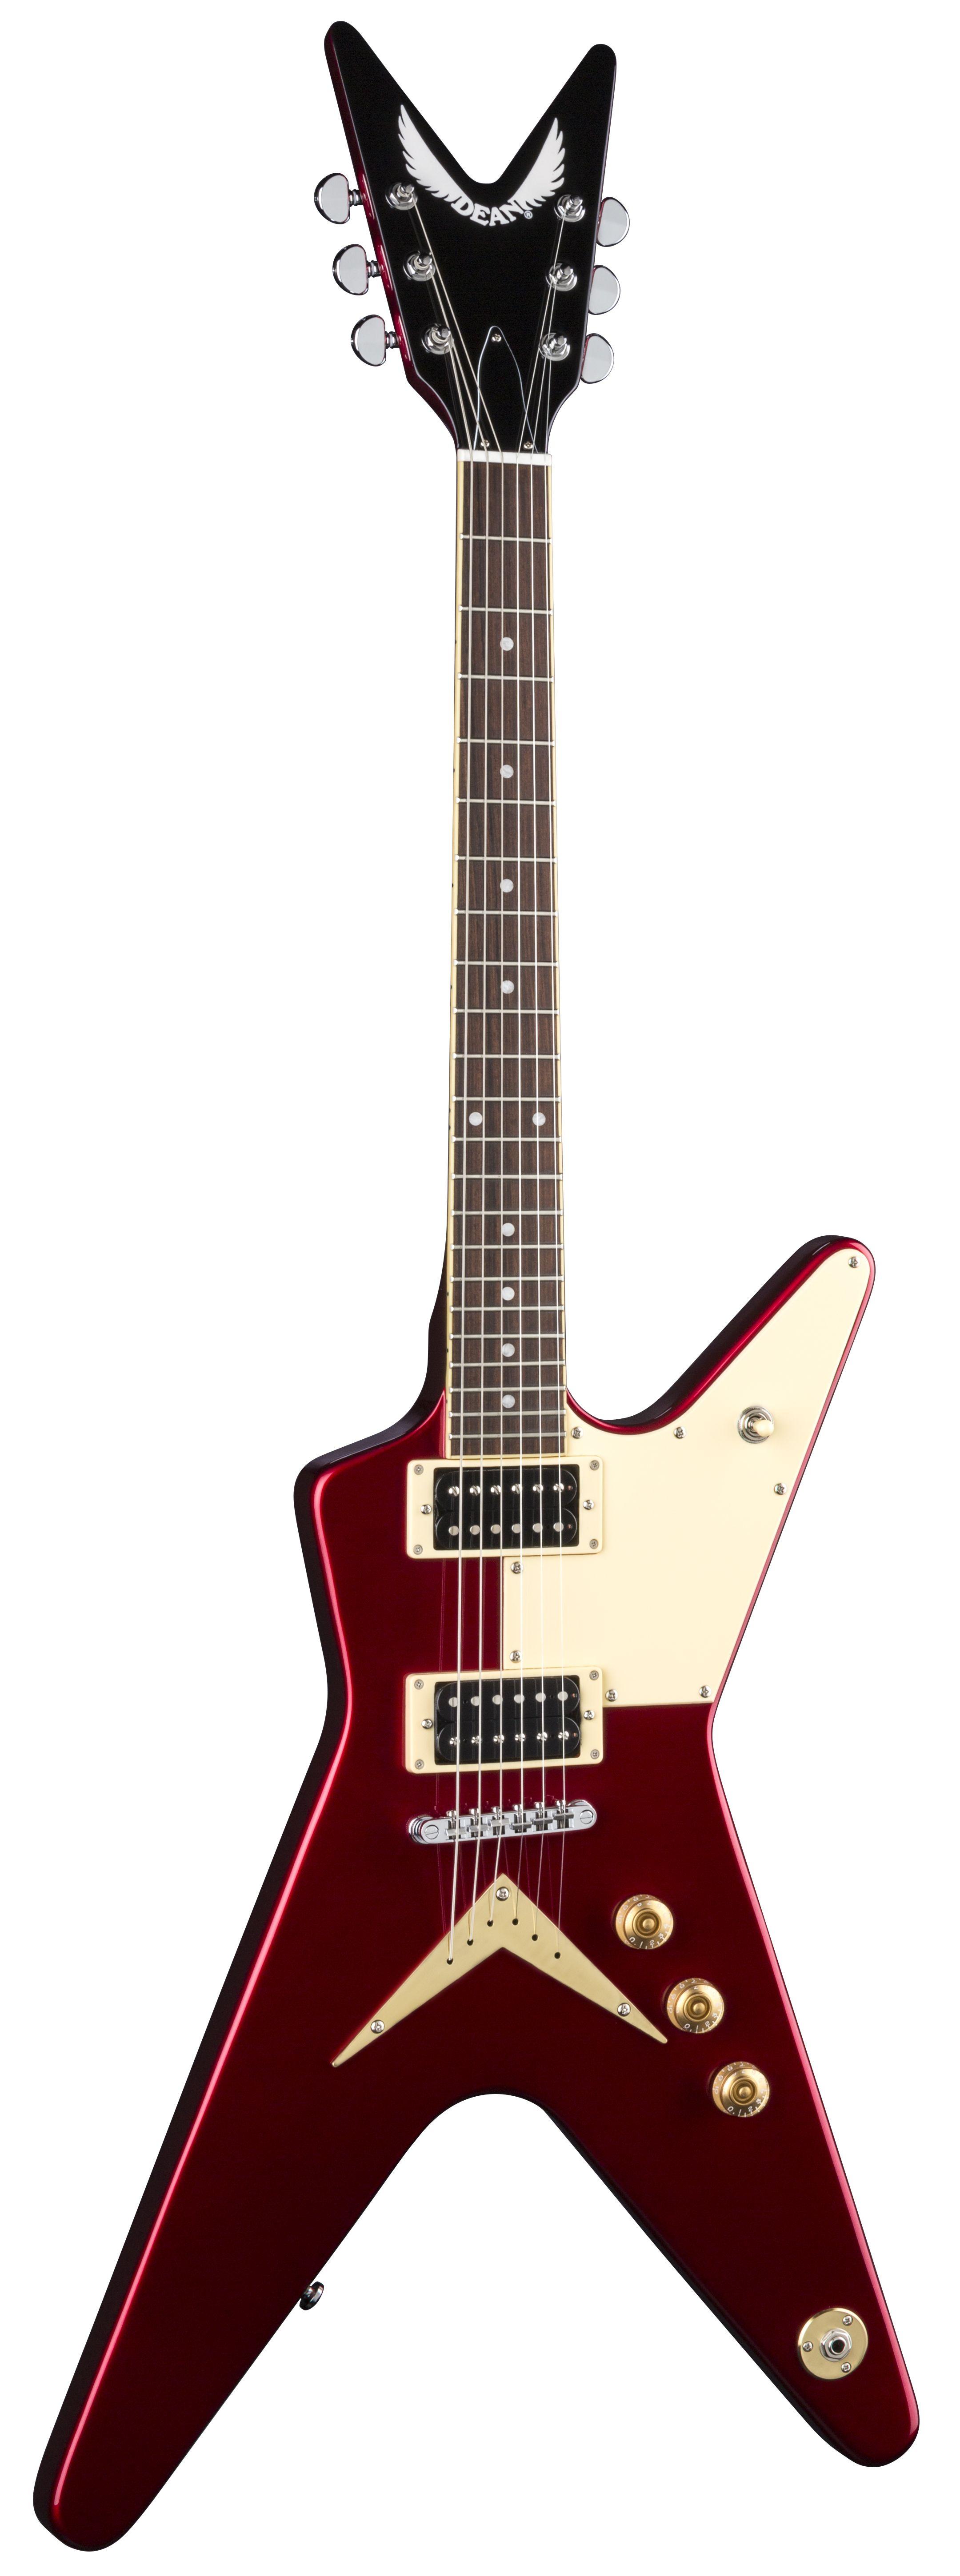 Dean Ml 79 Standard W Half Pg Metallic Red Electric Guitar Ml 79 Pg Mr